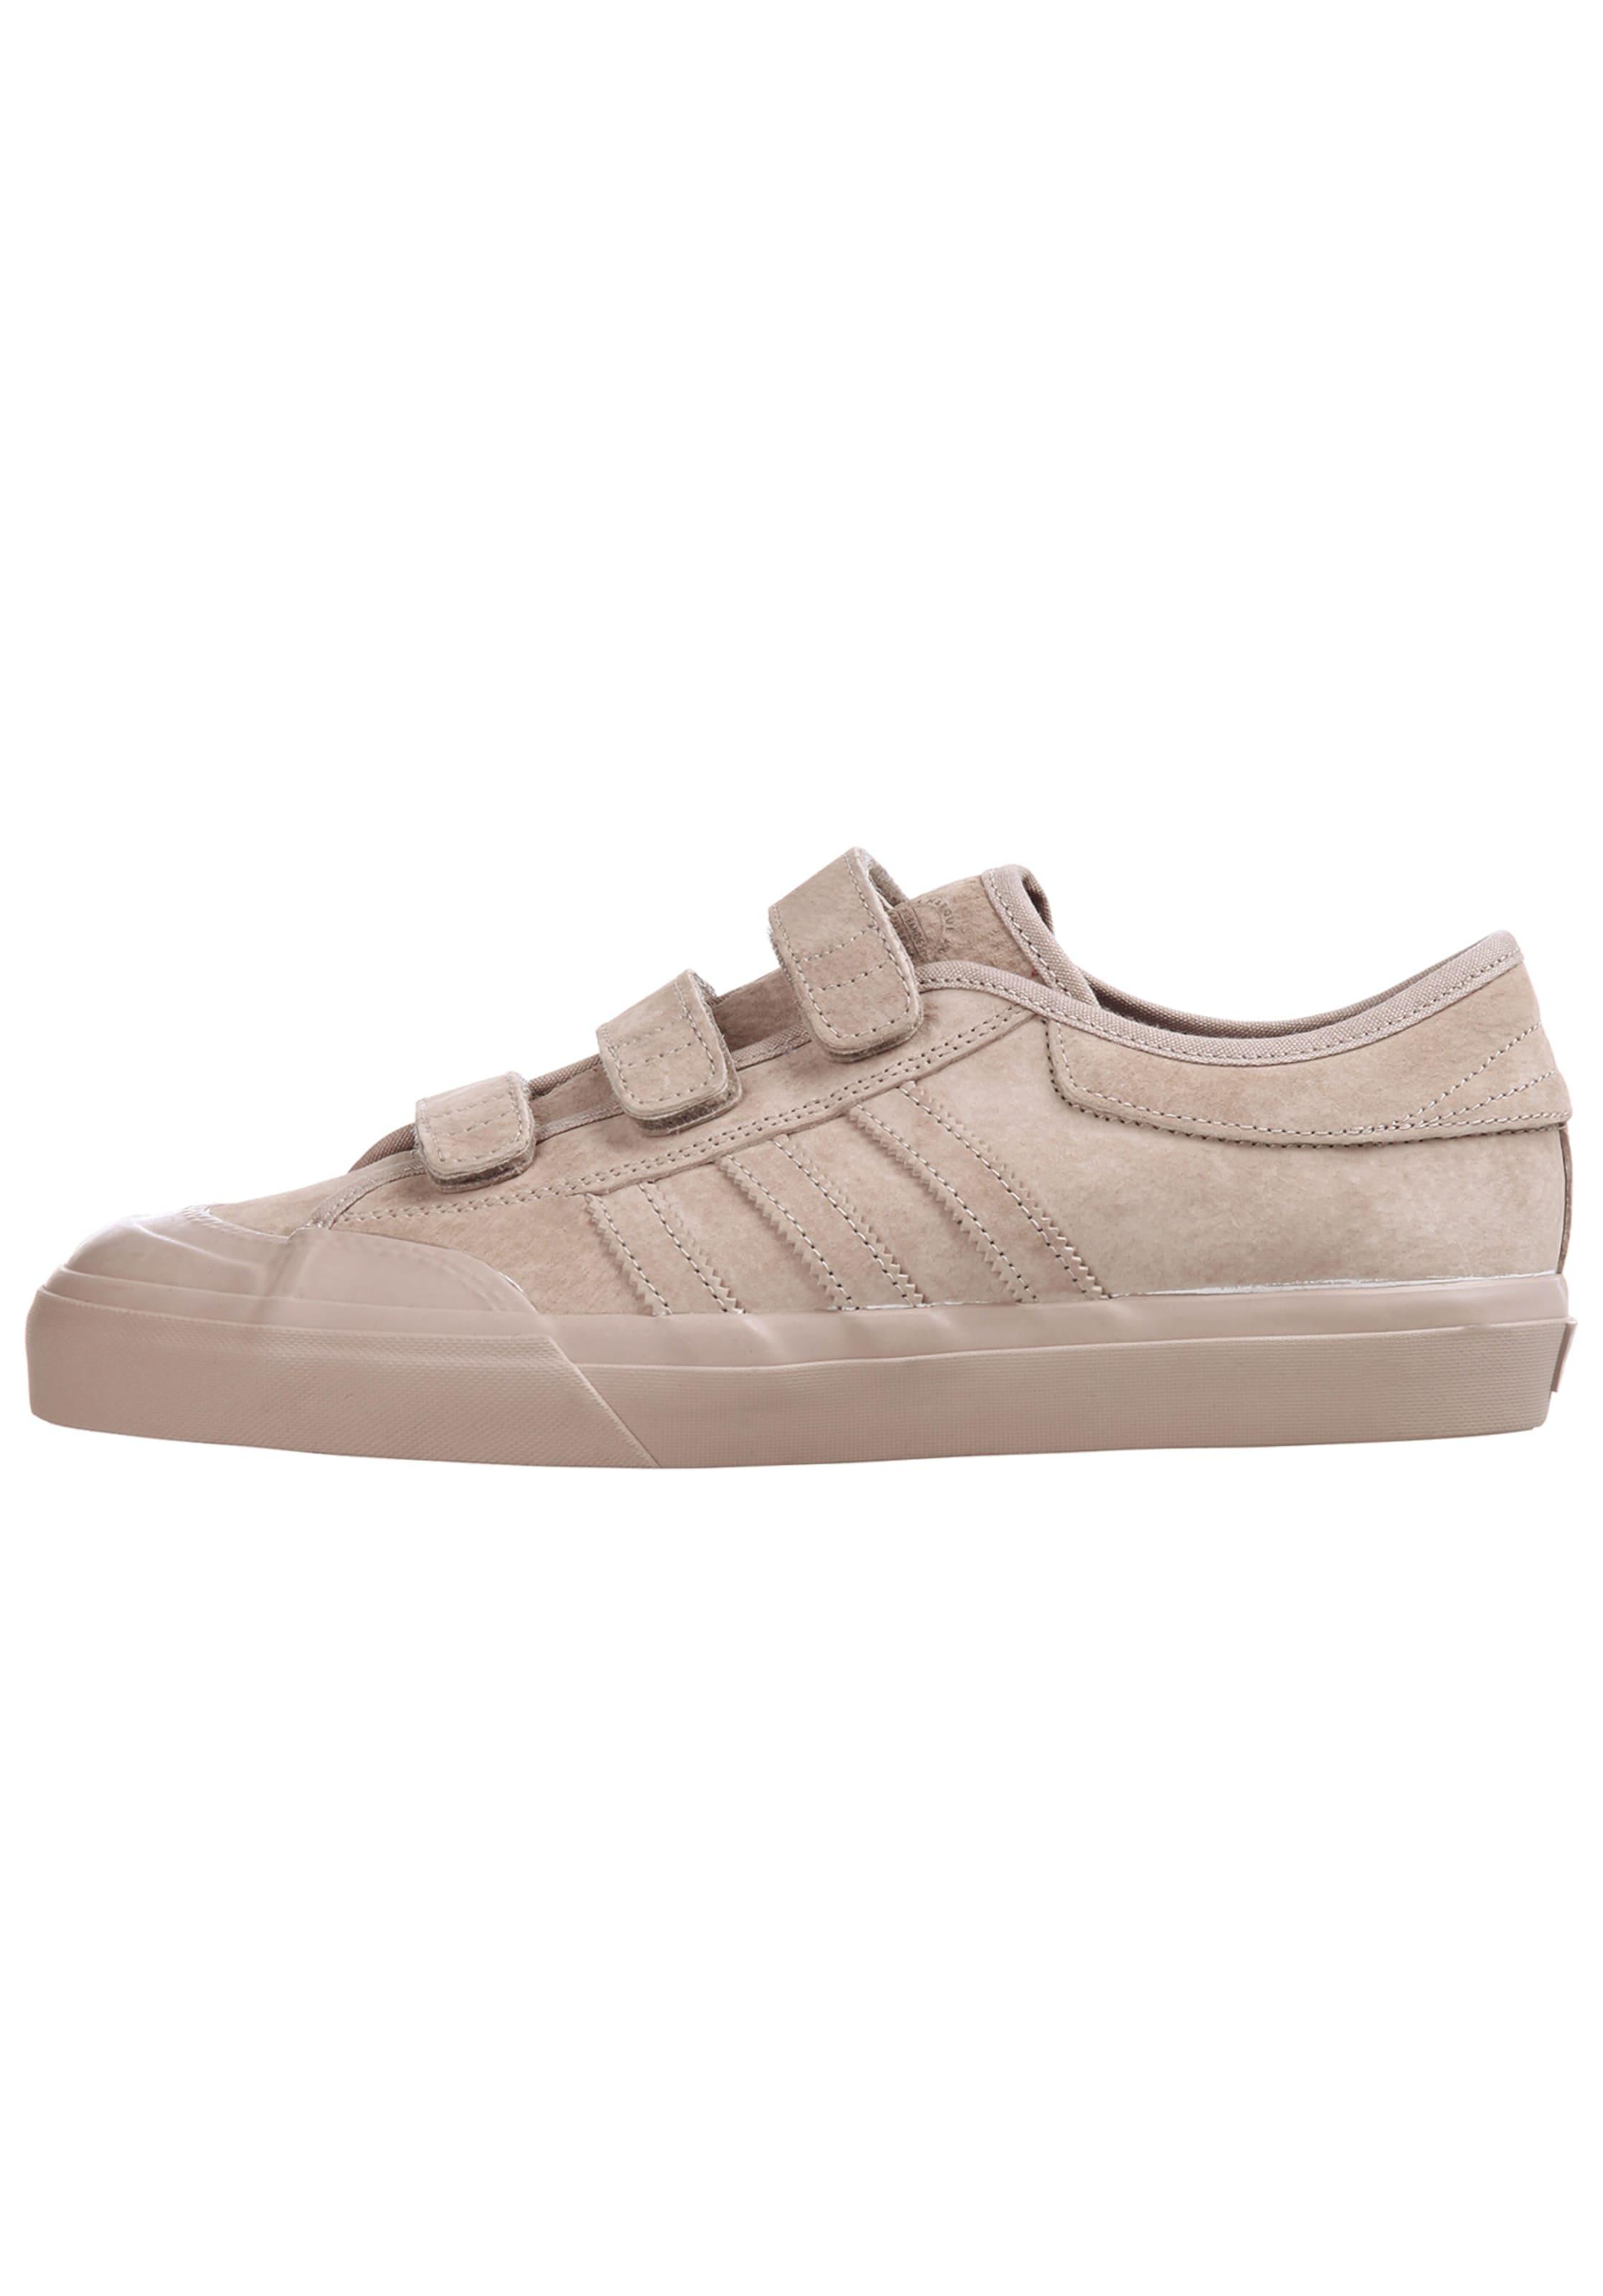 ADIDAS ORIGINALS Matchcourt CF Sneaker Hohe Qualität